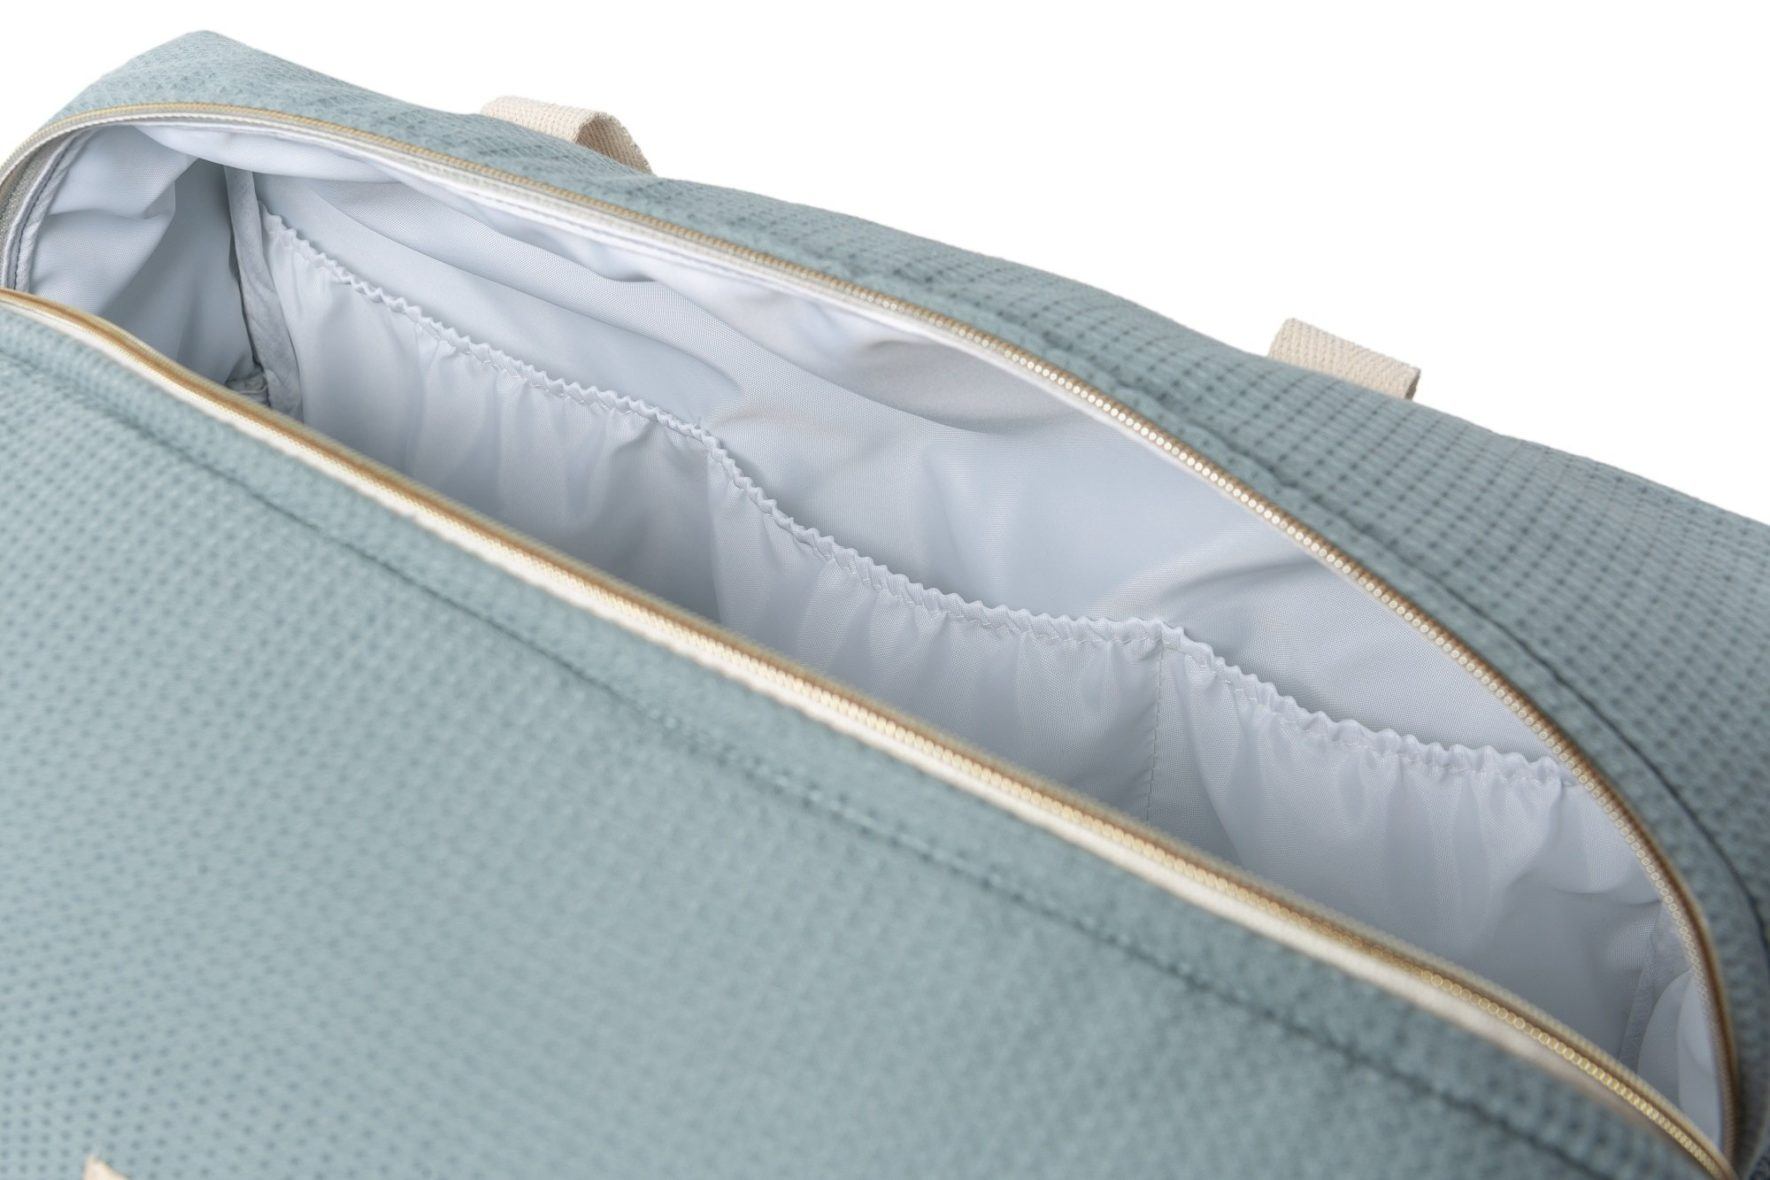 Opera Waterproof Maternity Bag Stone Blue Nobodinoz 10 8435574919236